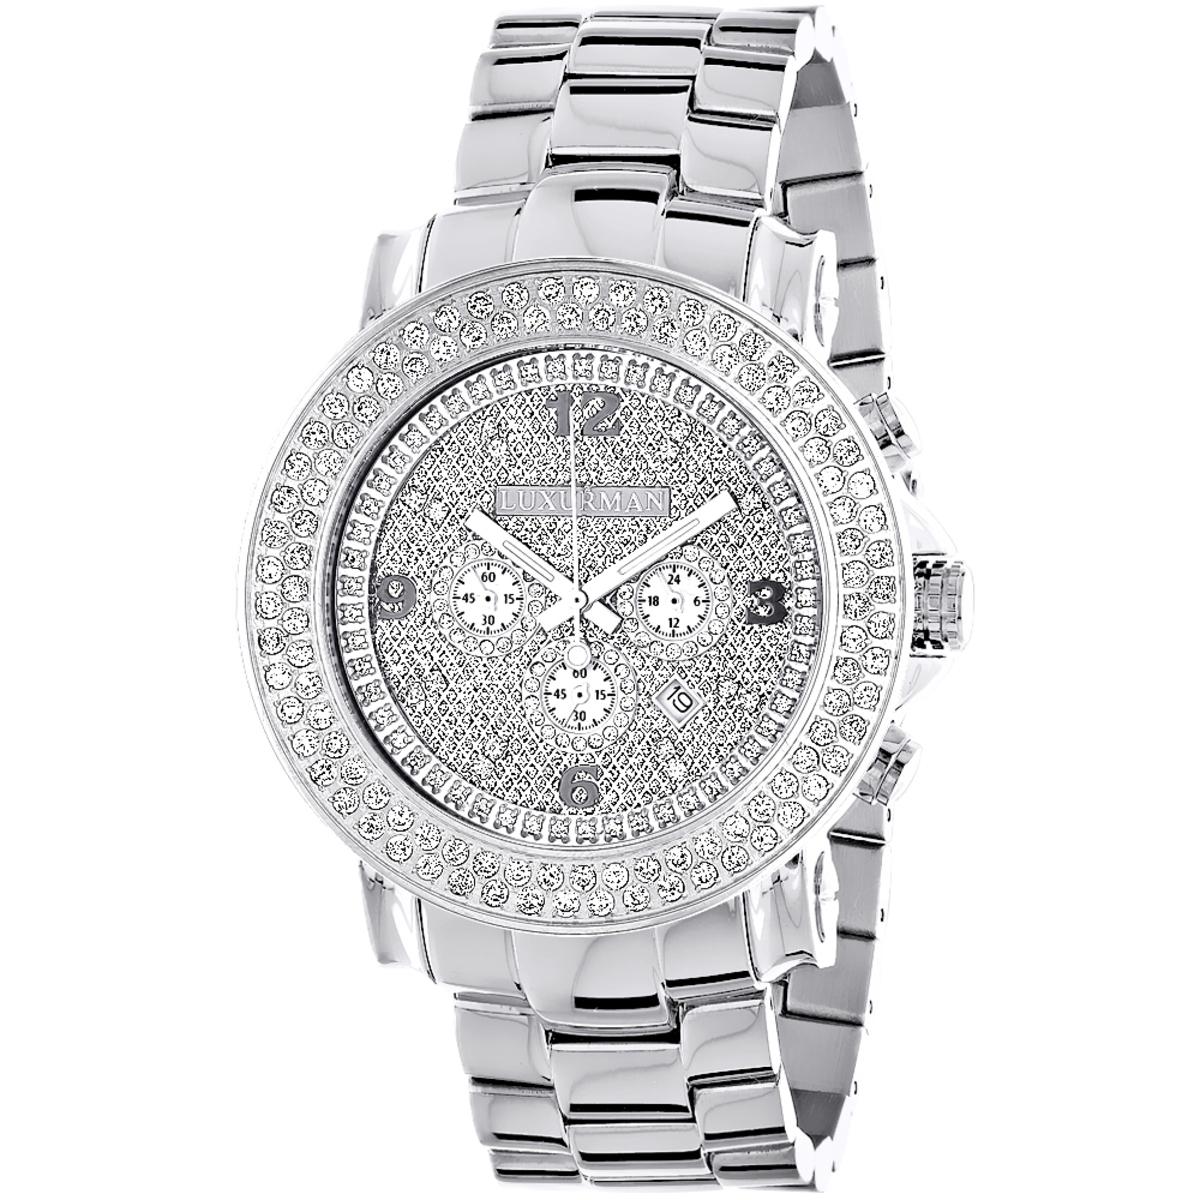 Large 2 Row Diamond Bezel Luxurman Watch 5ct New Arrival Oversized